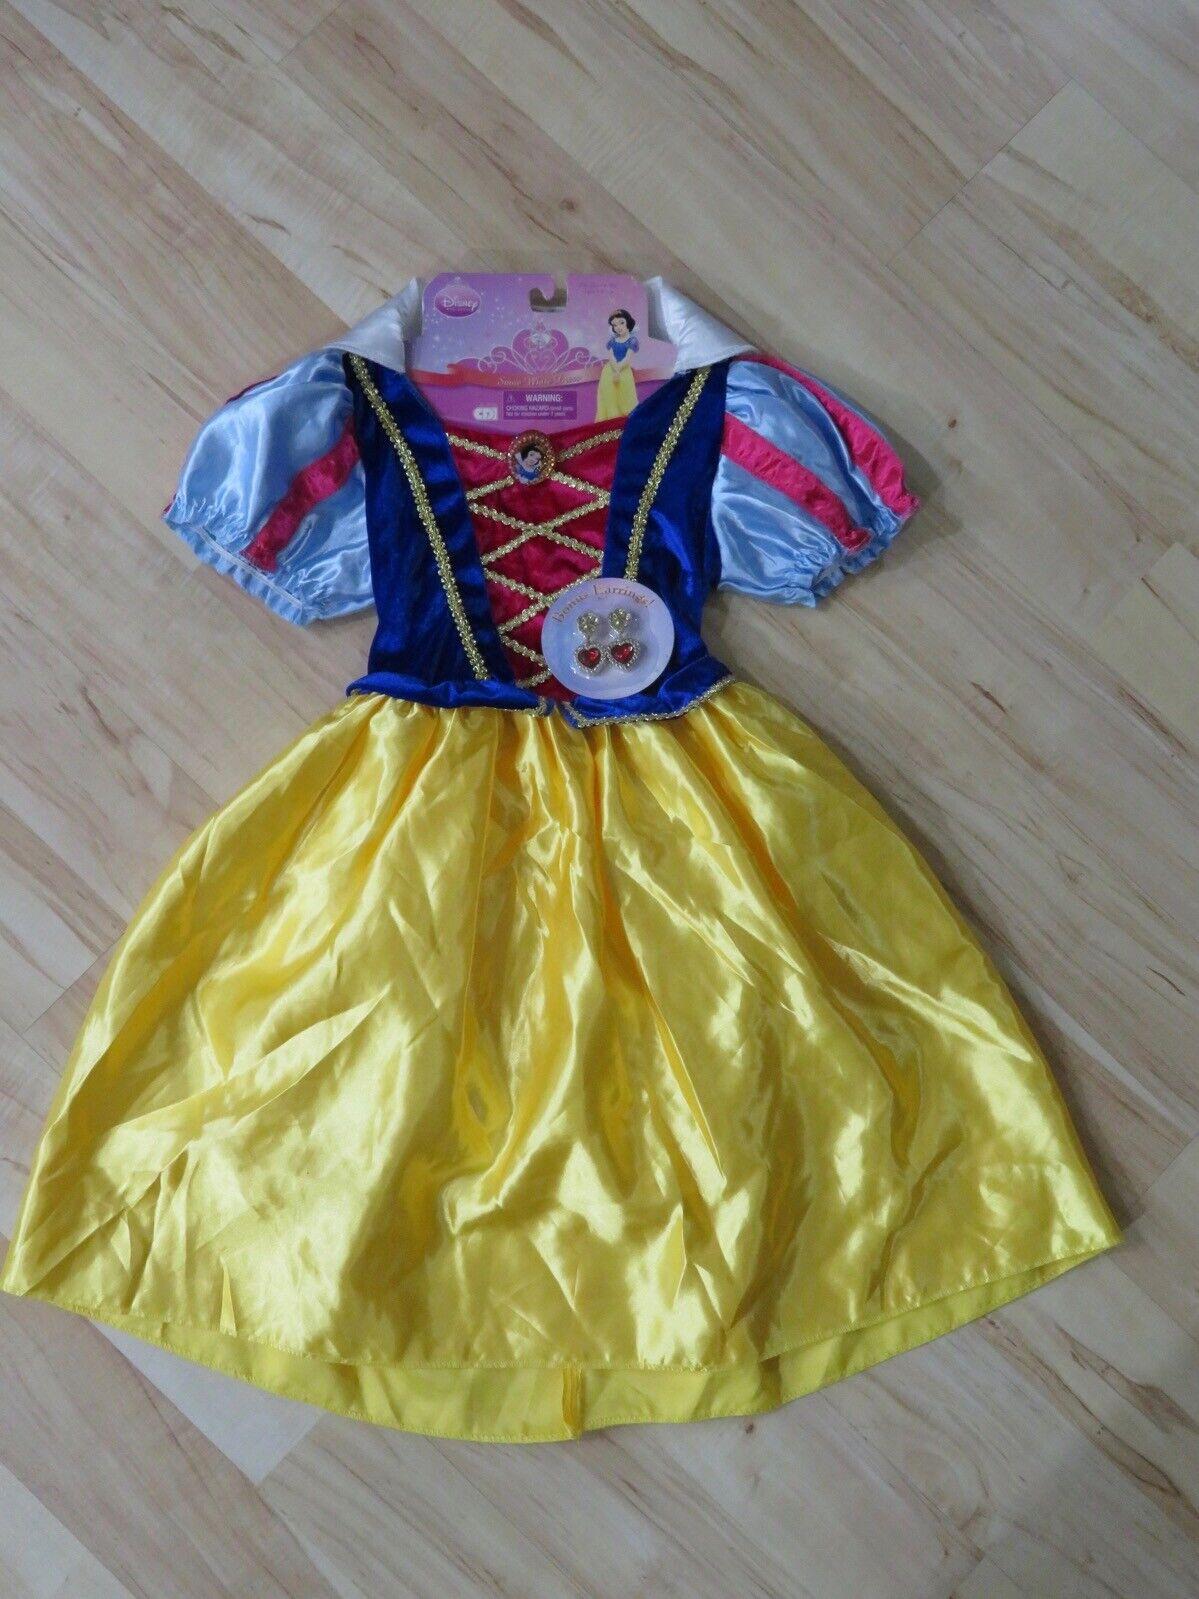 New Girl's Snow White Disney Princess Halloween Costume & Earrings Size 4/6X